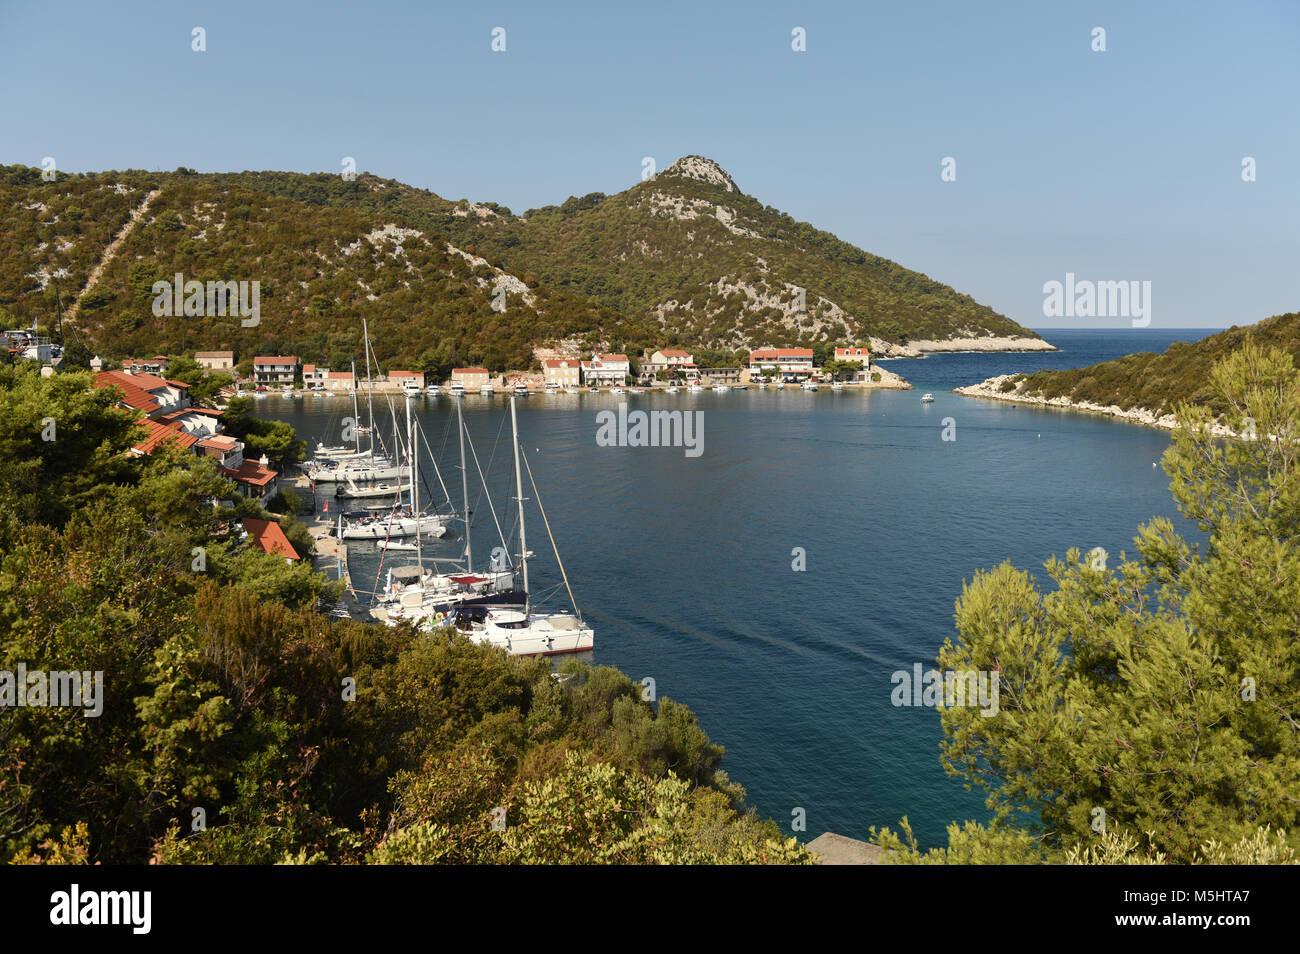 Village Zaklopatica on Lastovo island, Croatia. - Stock Image